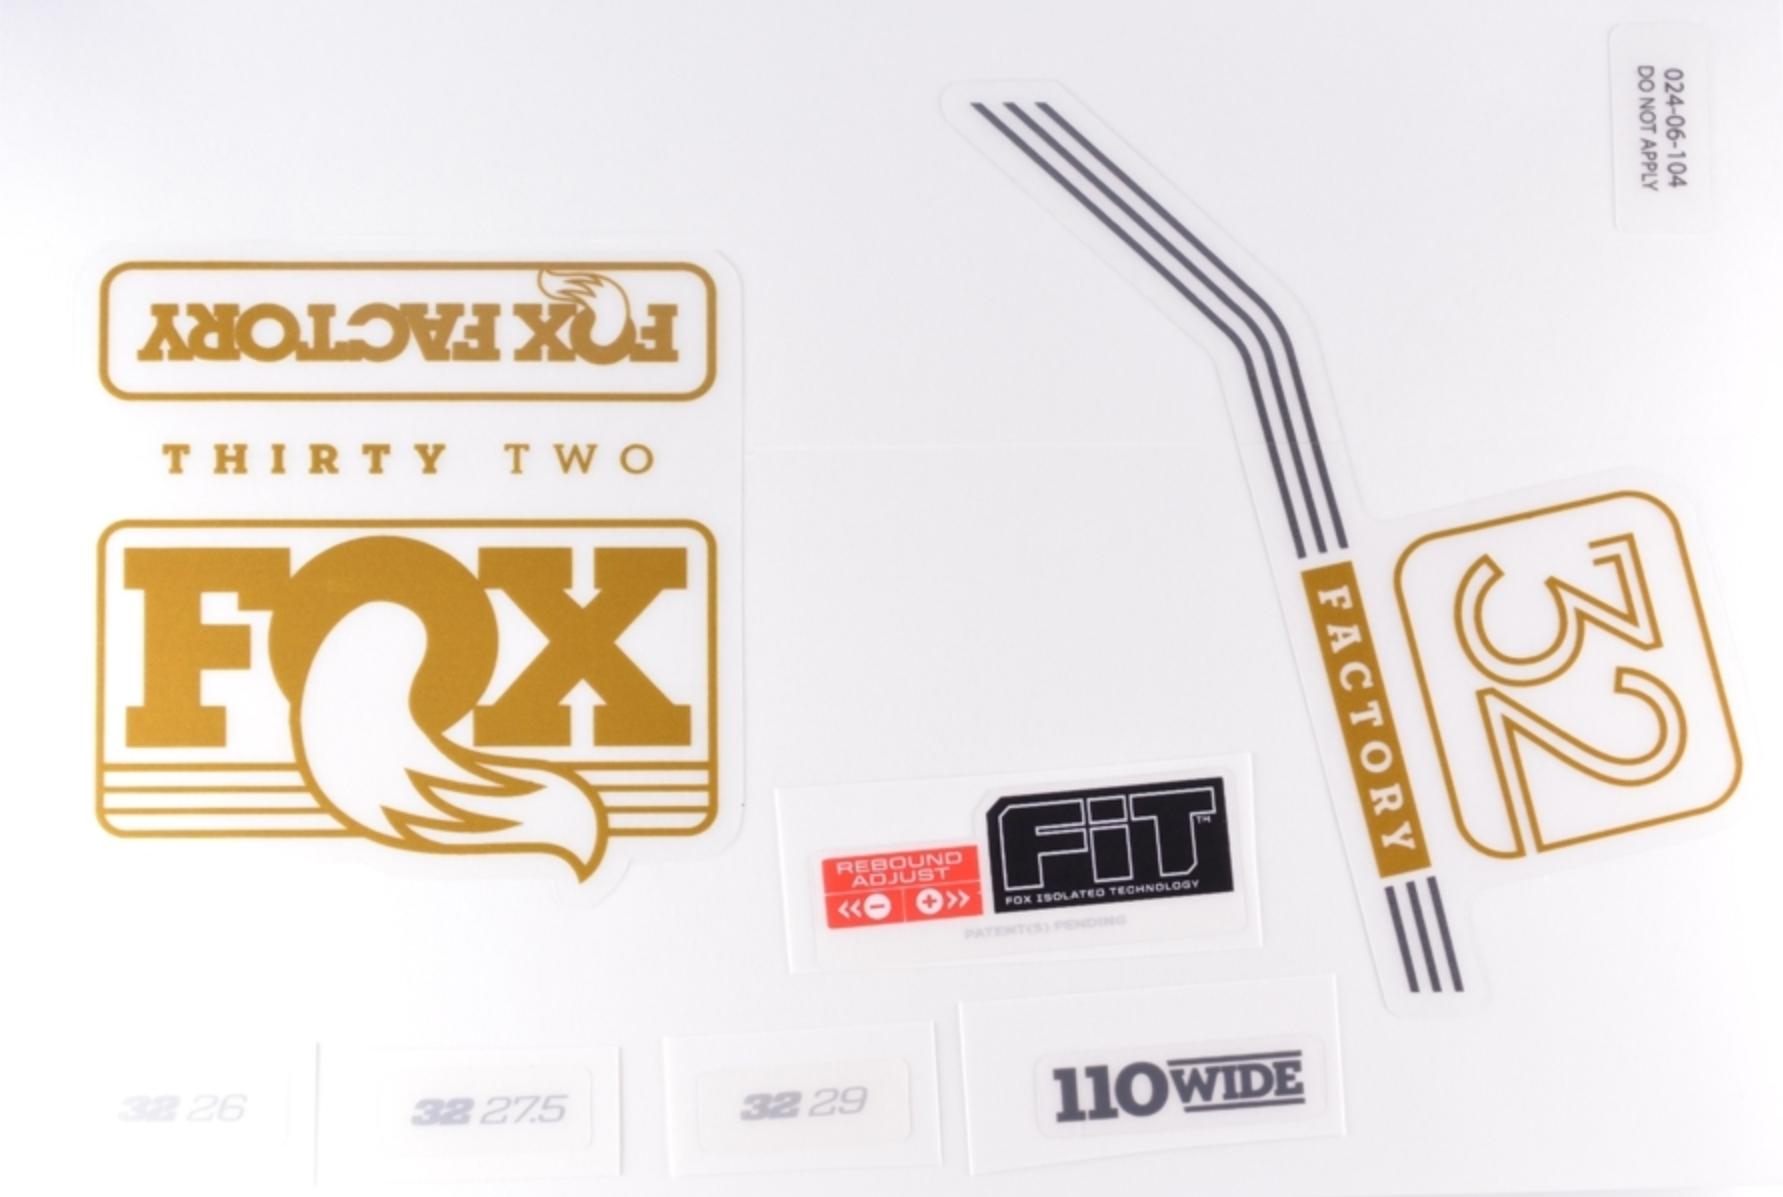 FOX สติ๊กเกอร์โช๊คหน้า Factory 2016 สีทอง